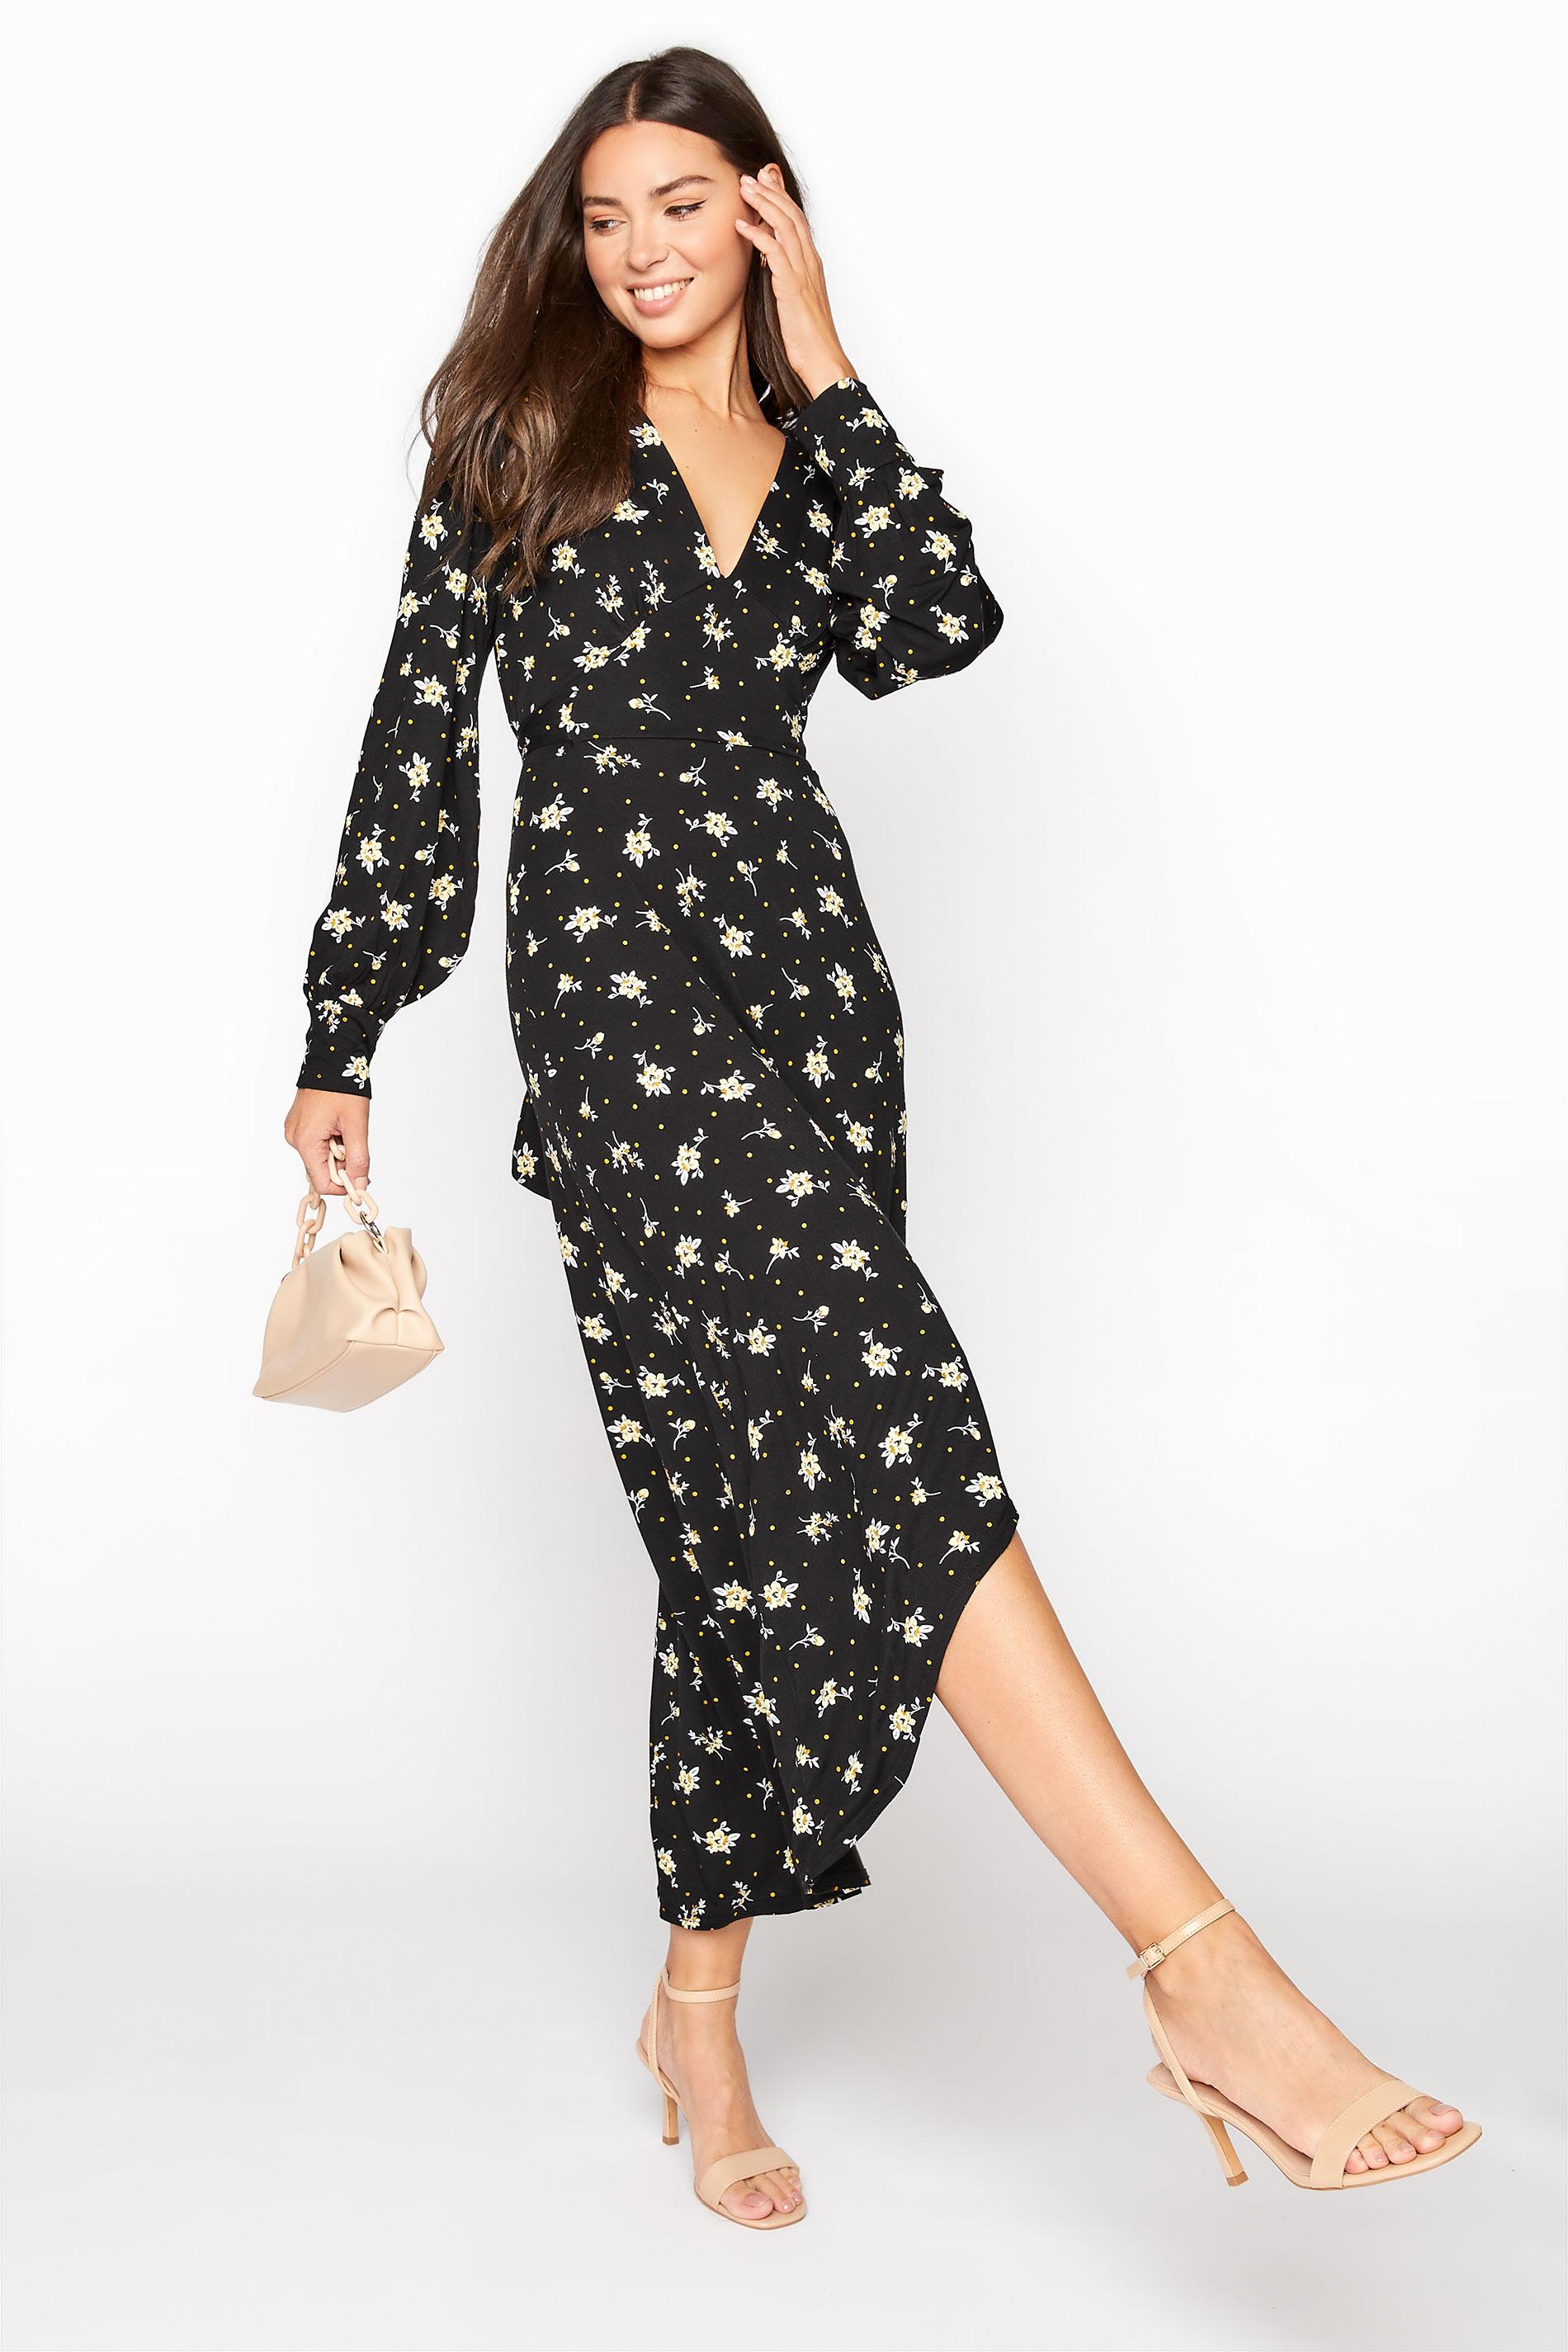 LTS Black Floral Print Hanky Hem Midaxi Dress